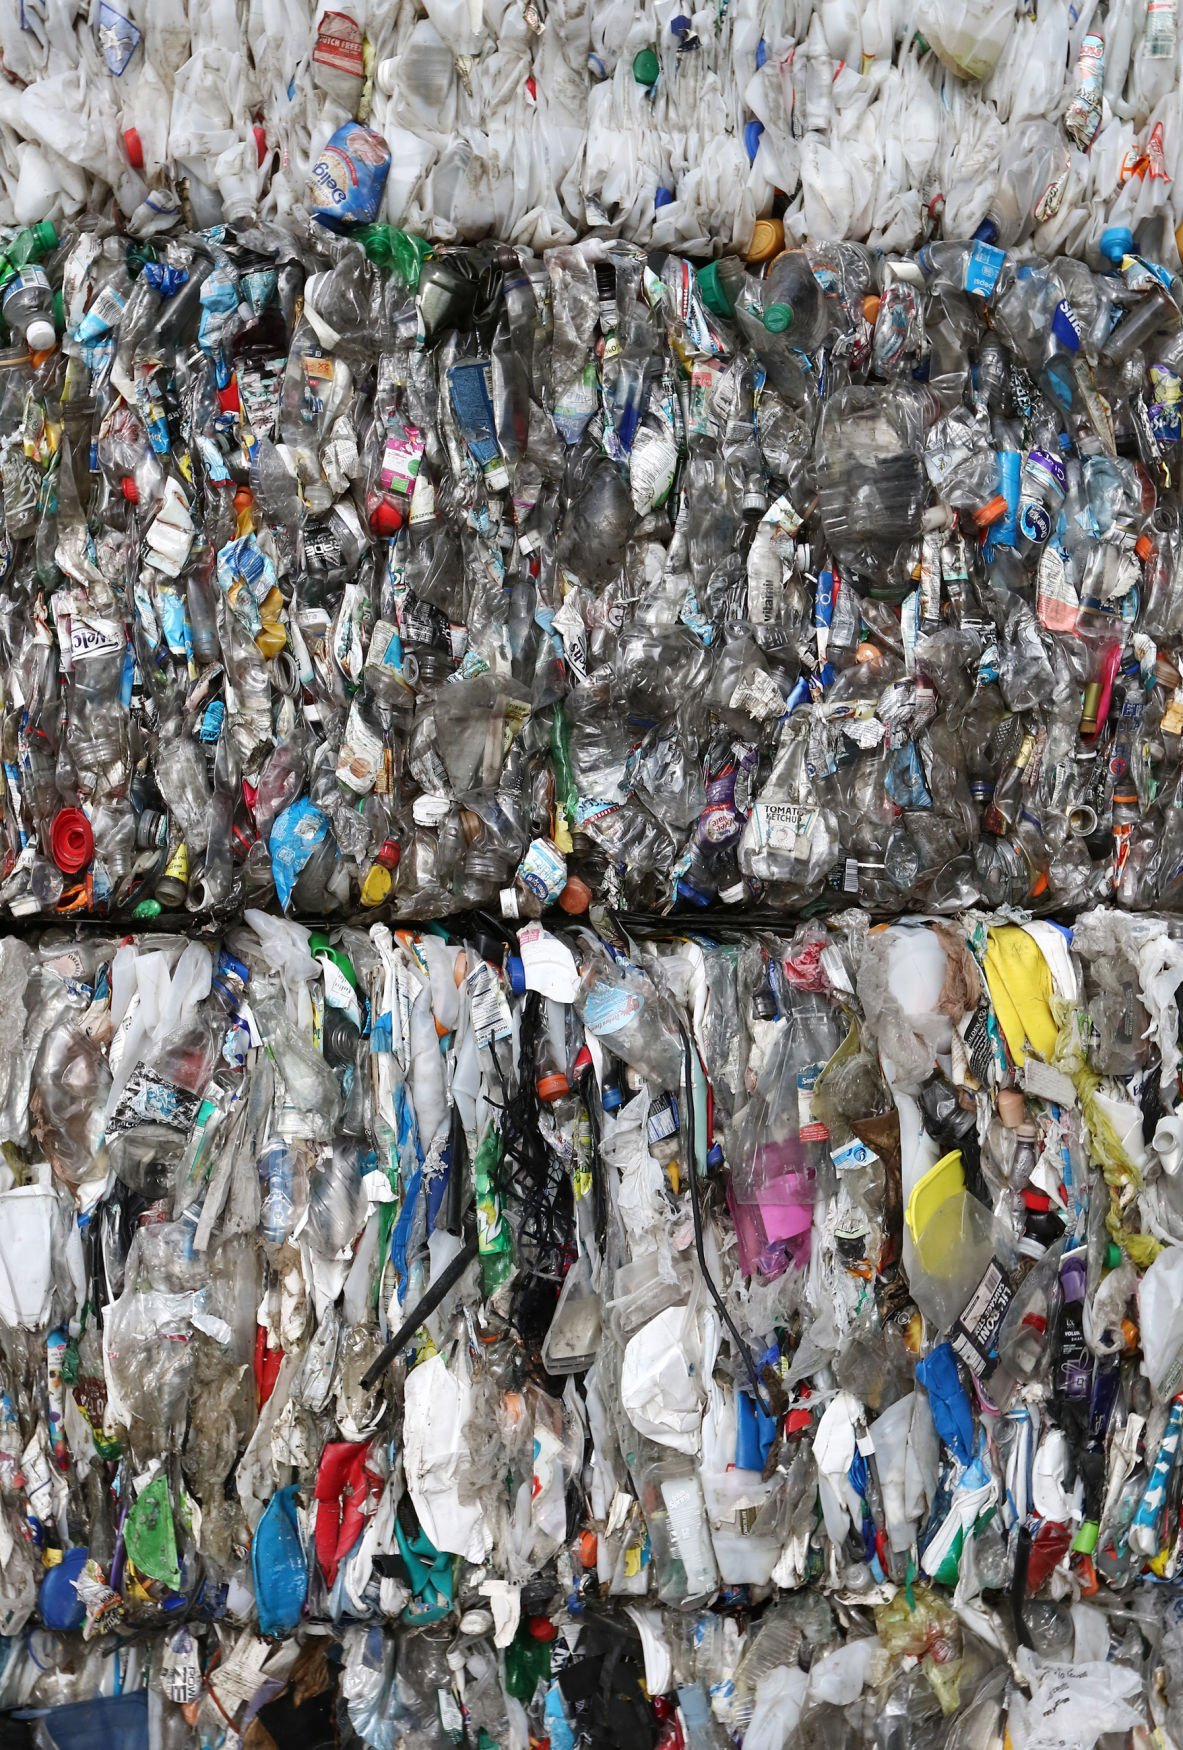 180121-nrr-recycling-02